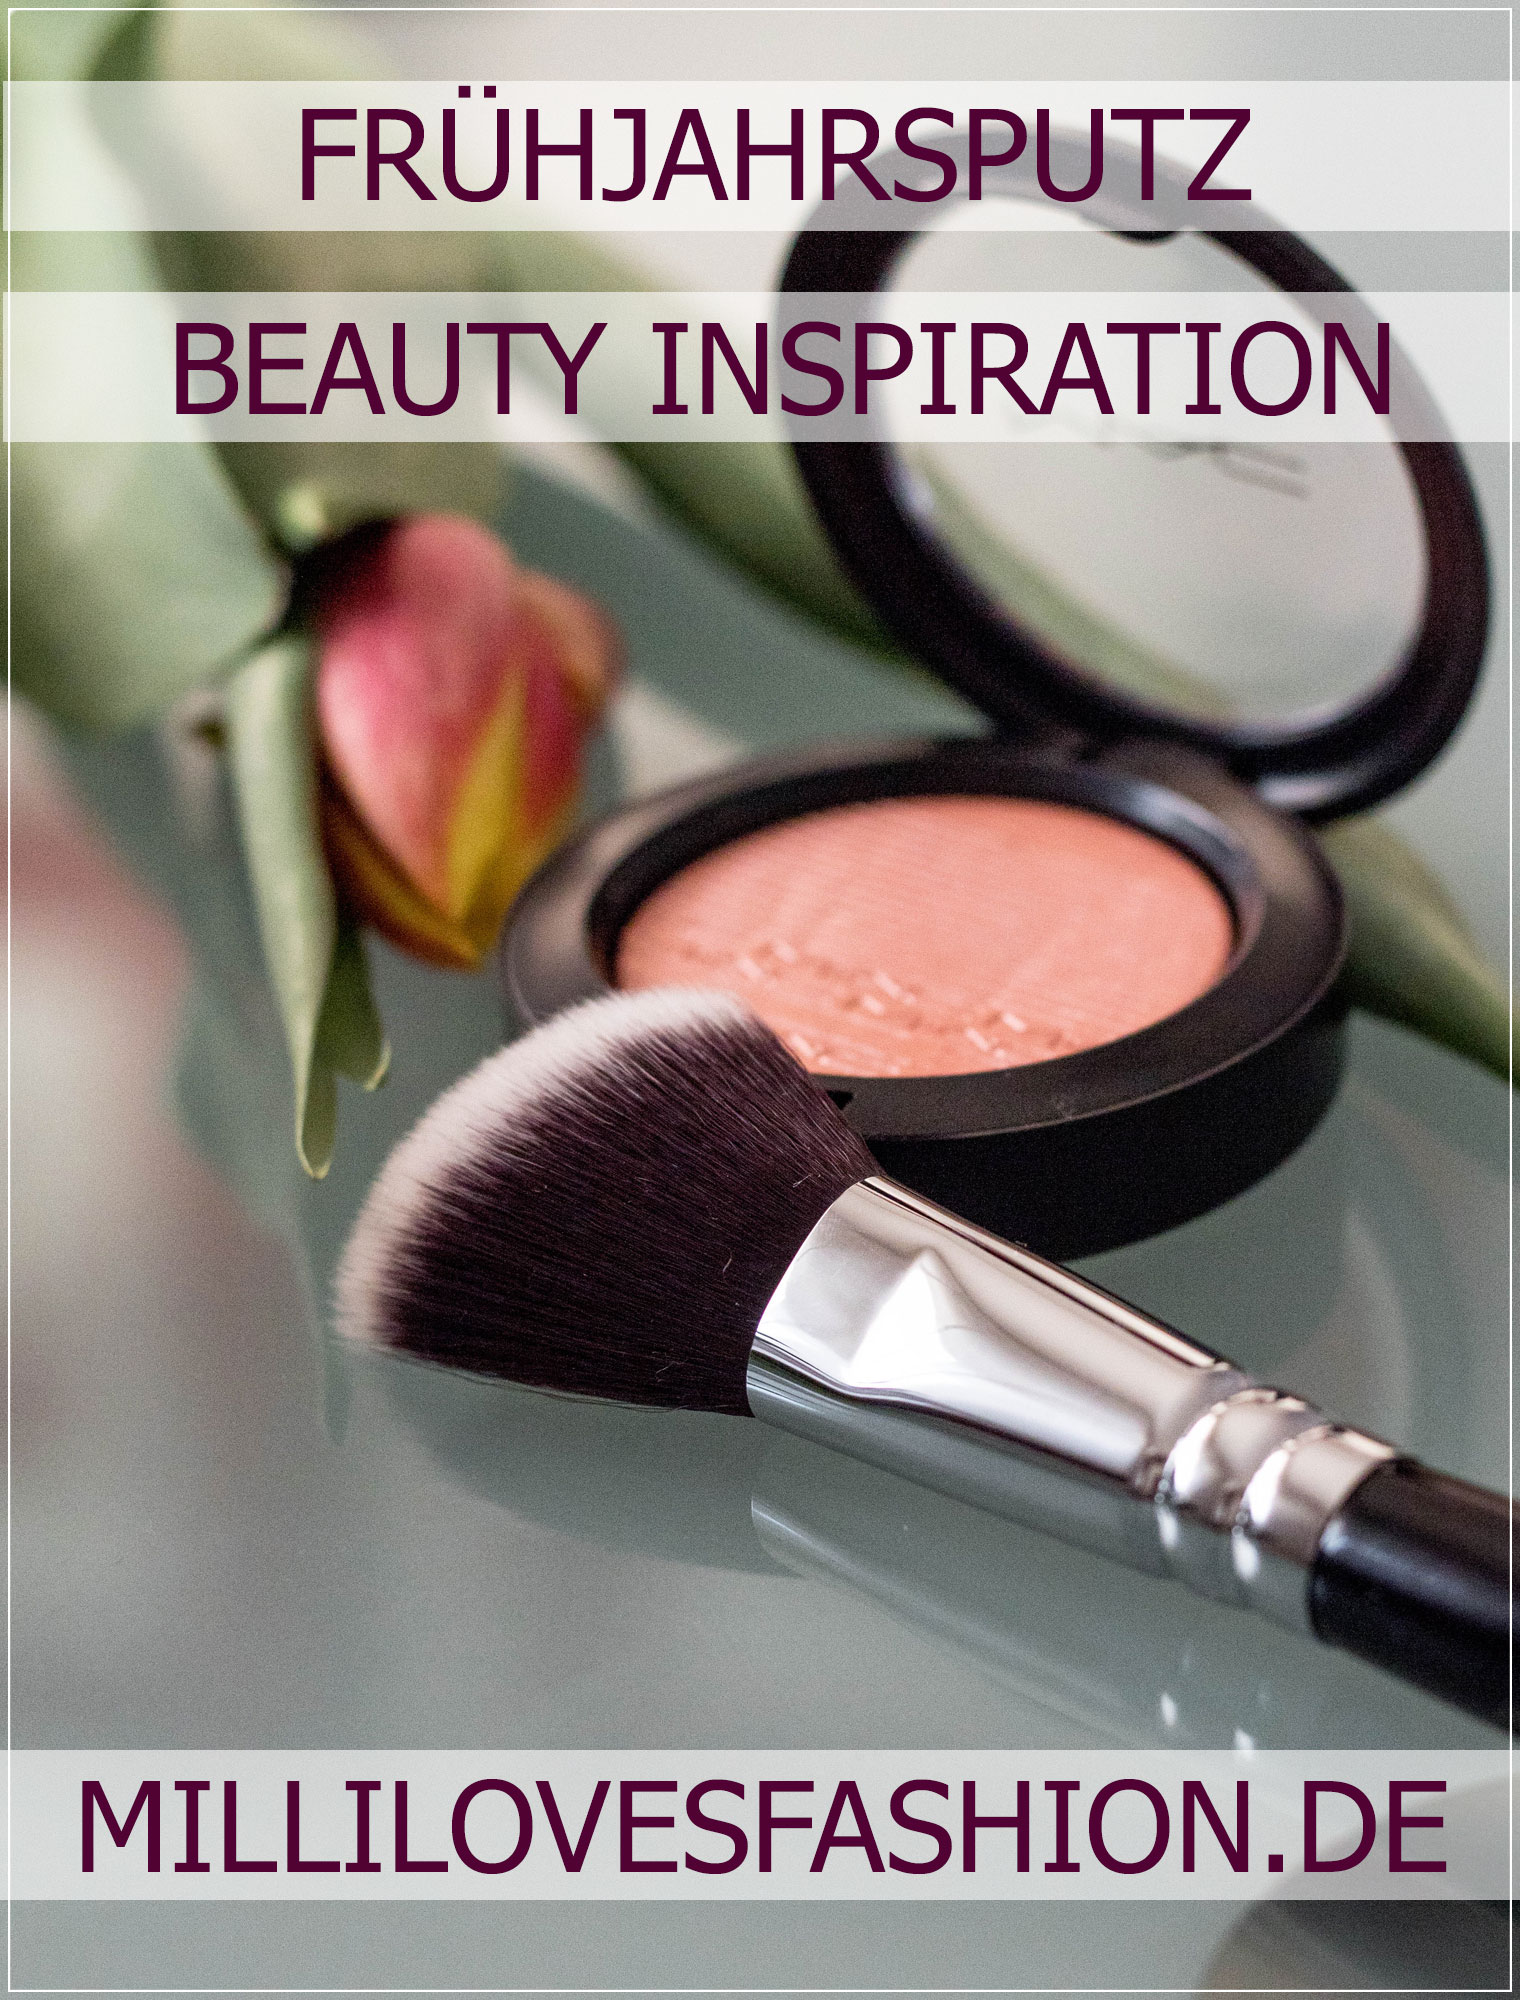 Parfümerie Rüdell, Frühjahrsputz, Beautyneuheiten, Frühlingsmakeup, Frühlingsbeautyprodukte, Frühlingsneuheiten, Rosétöne, Rouge, Beautytipps